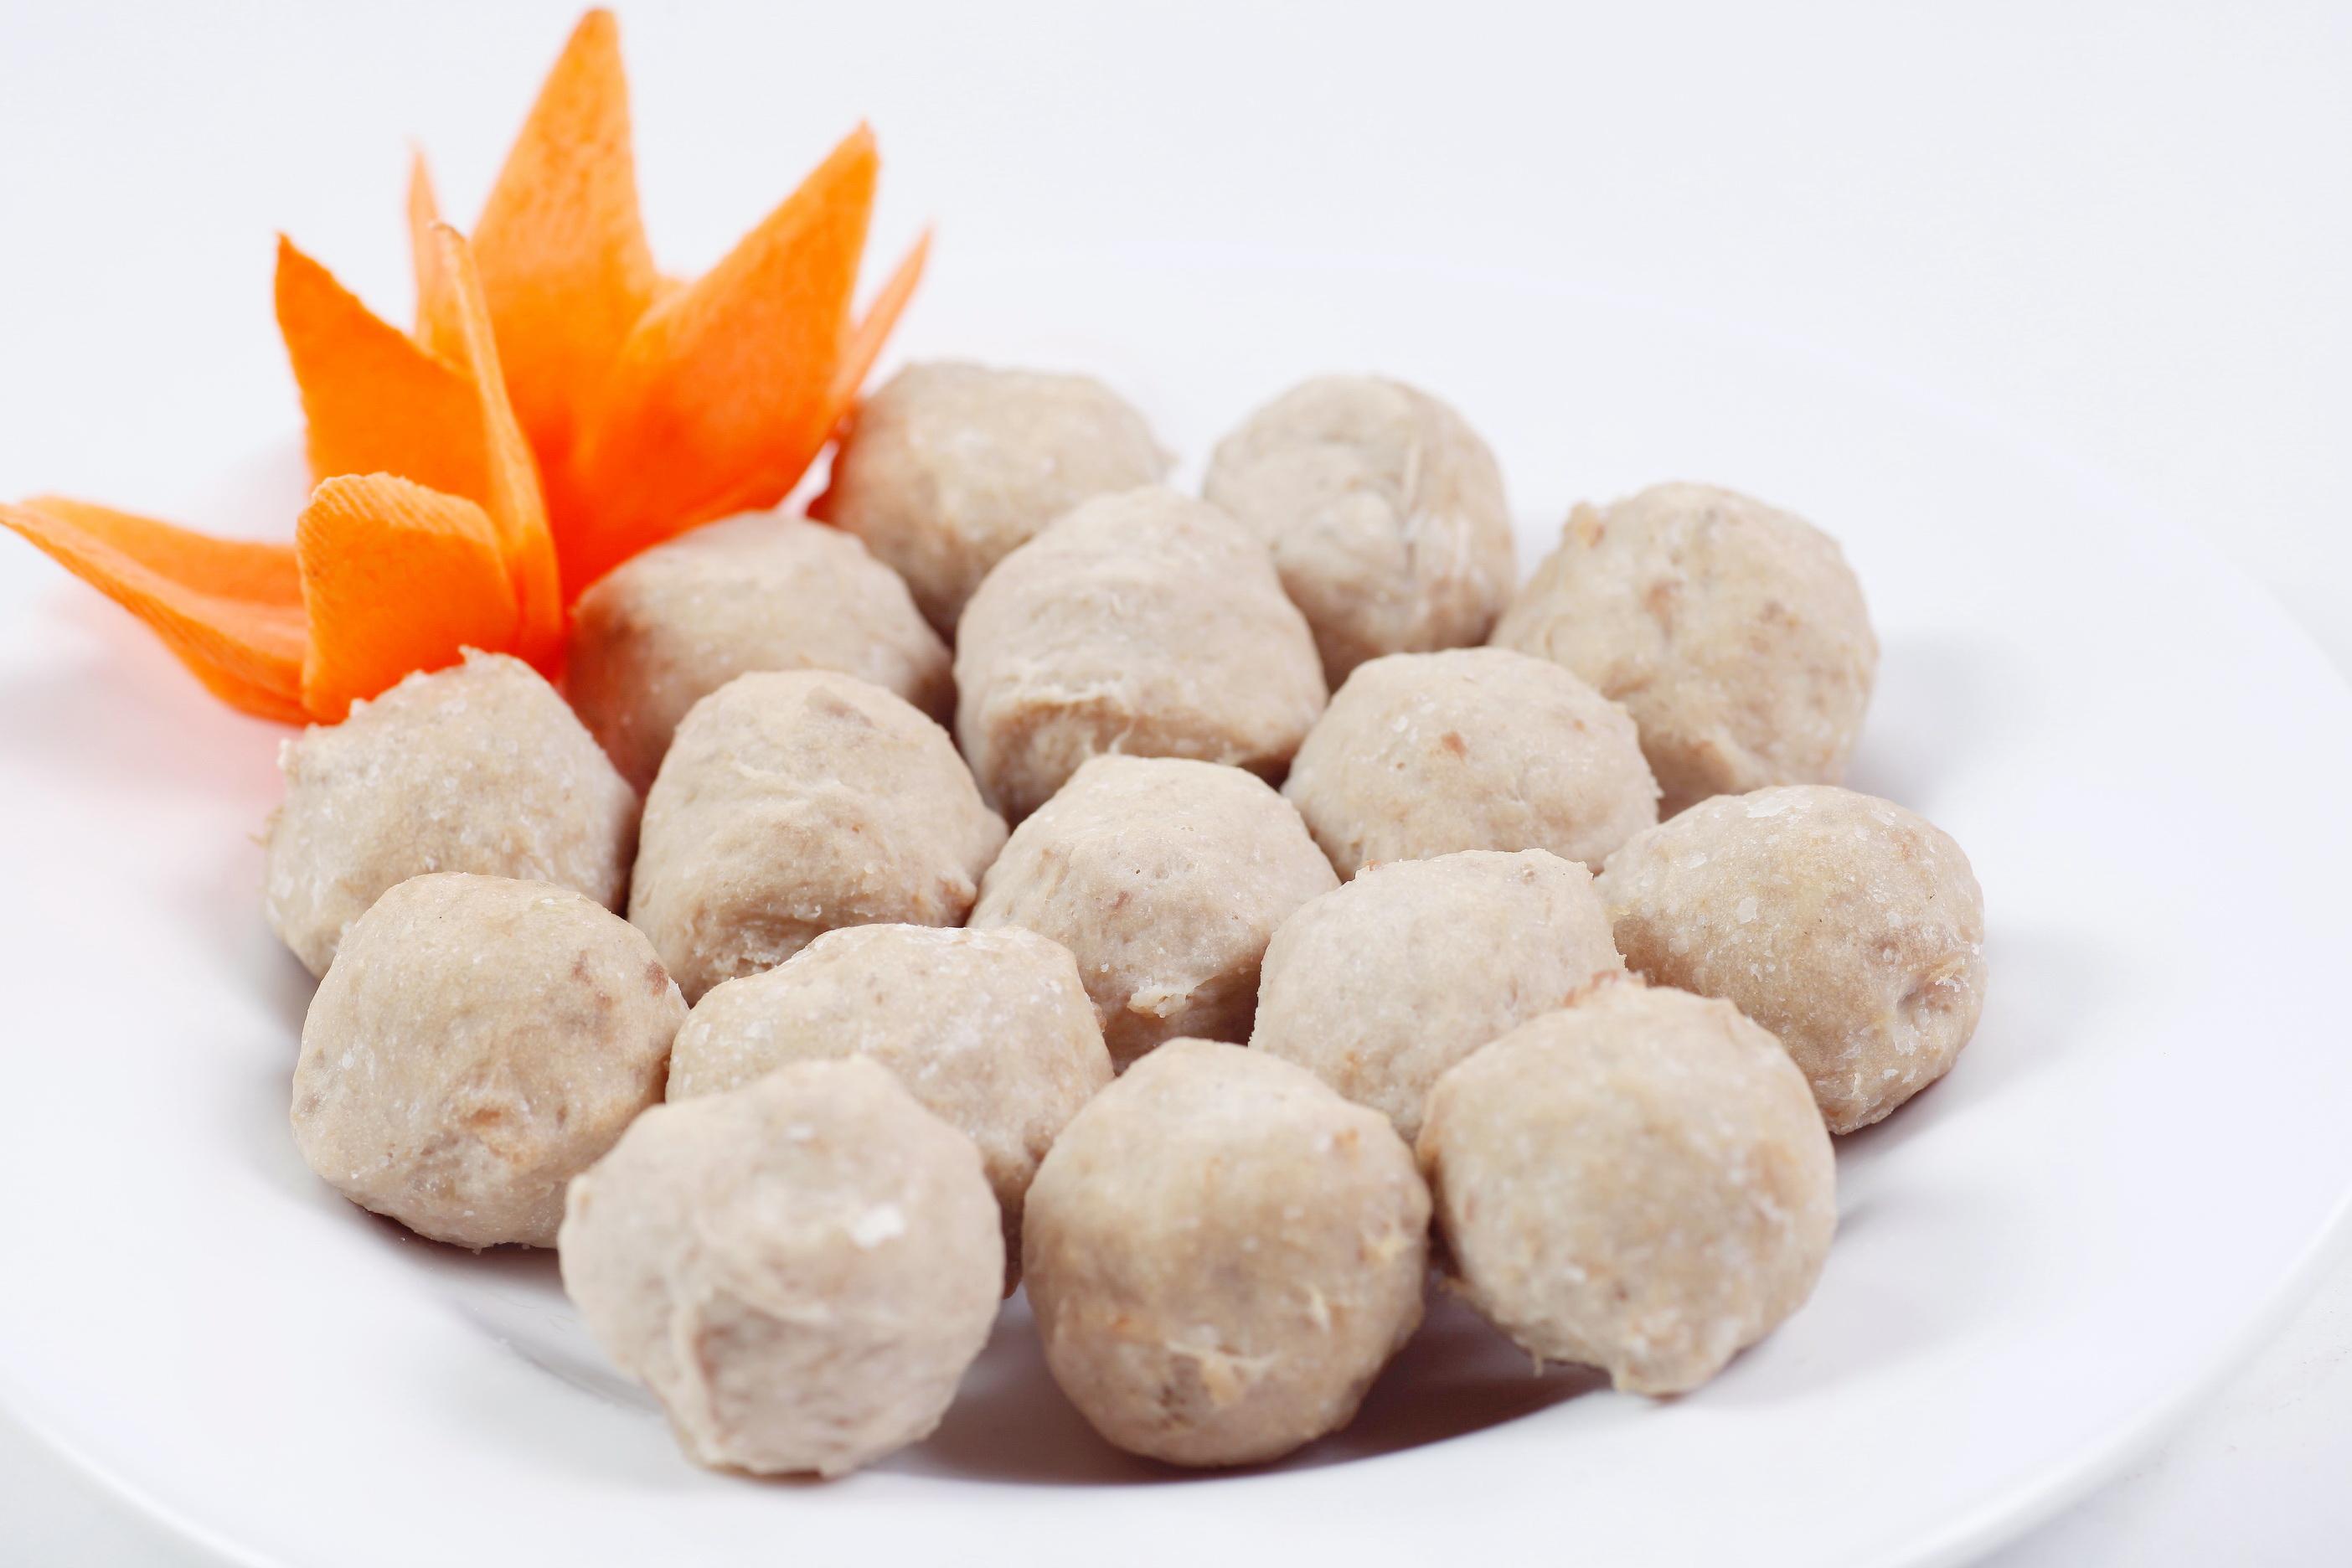 nhung-mon-an-vat-sai-gon-duoi-5k